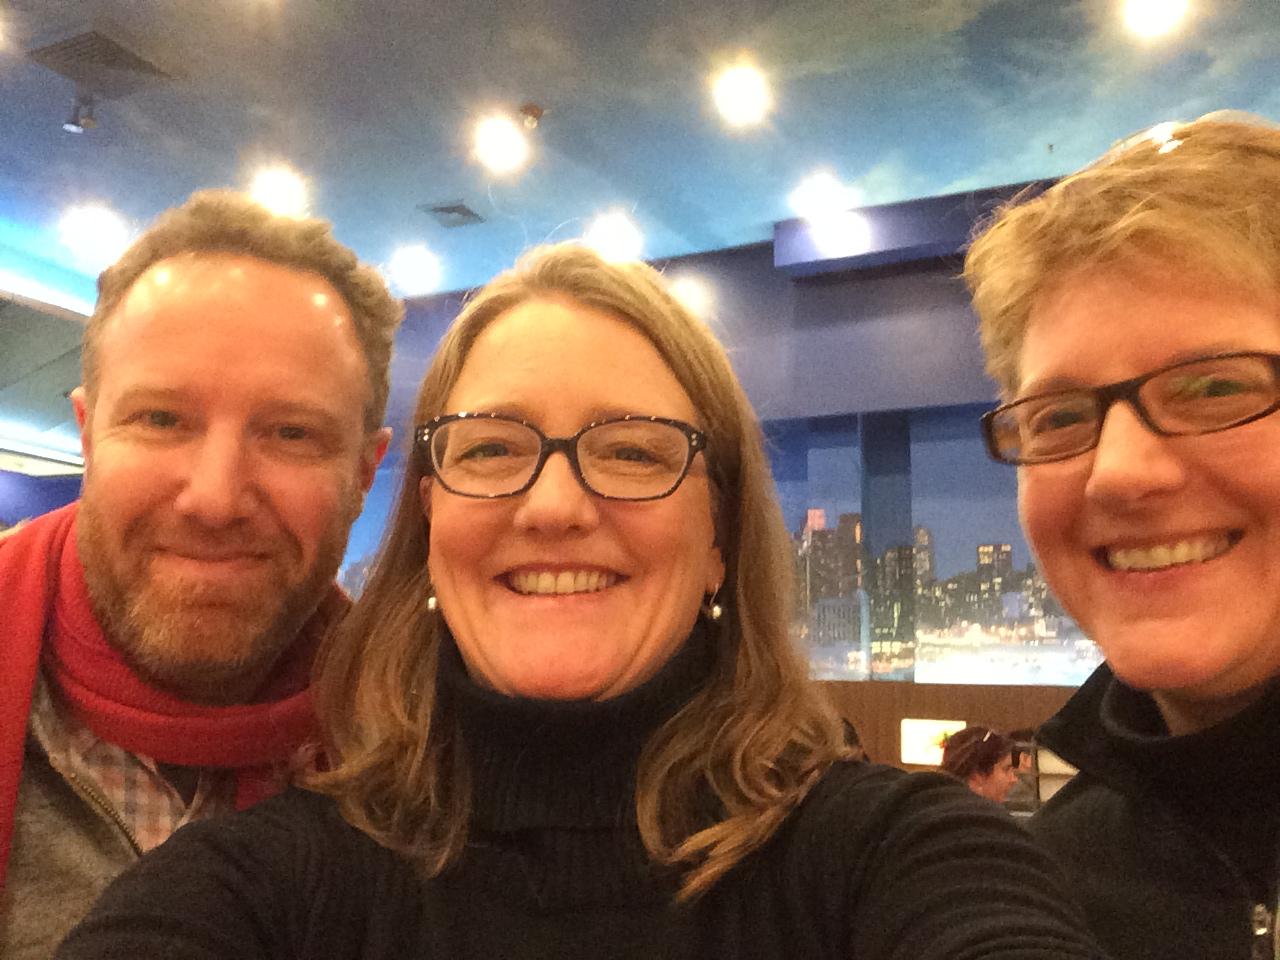 Dan Blank, Sarah Towle, Emma D. Dryden